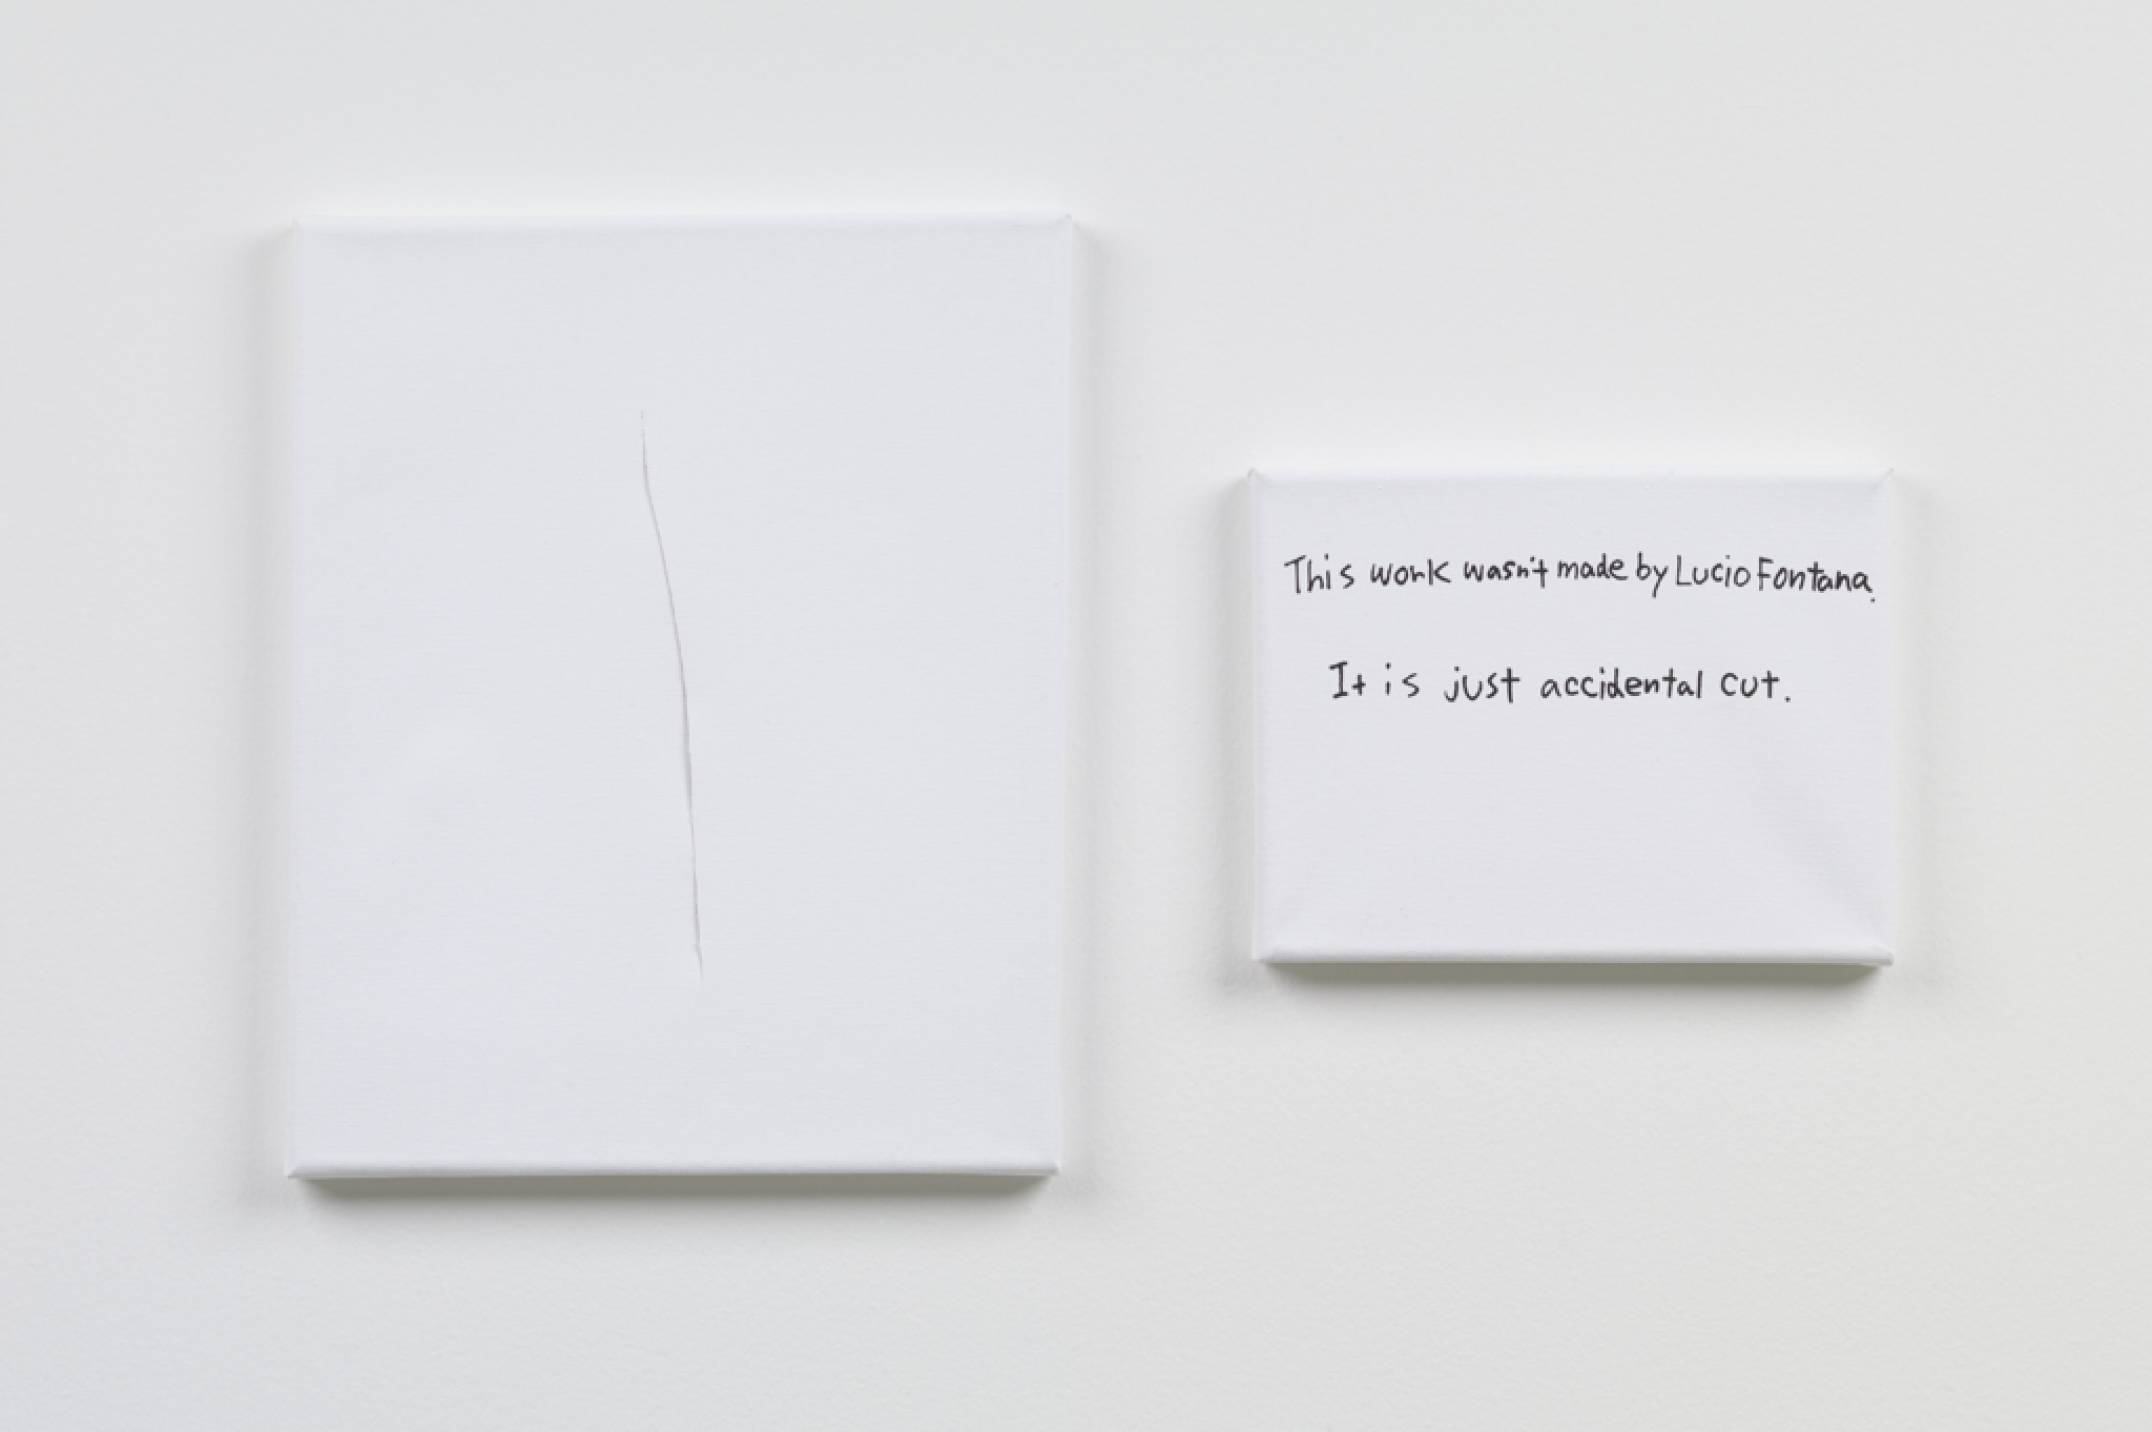 Ken Kagami,&nbsp;<em>This work wasn't made by Lucio Fontana</em>,&nbsp;2017, marker on canvas, 27 × 22 cm /&nbsp;14 × 18 cm - Mendes Wood DM